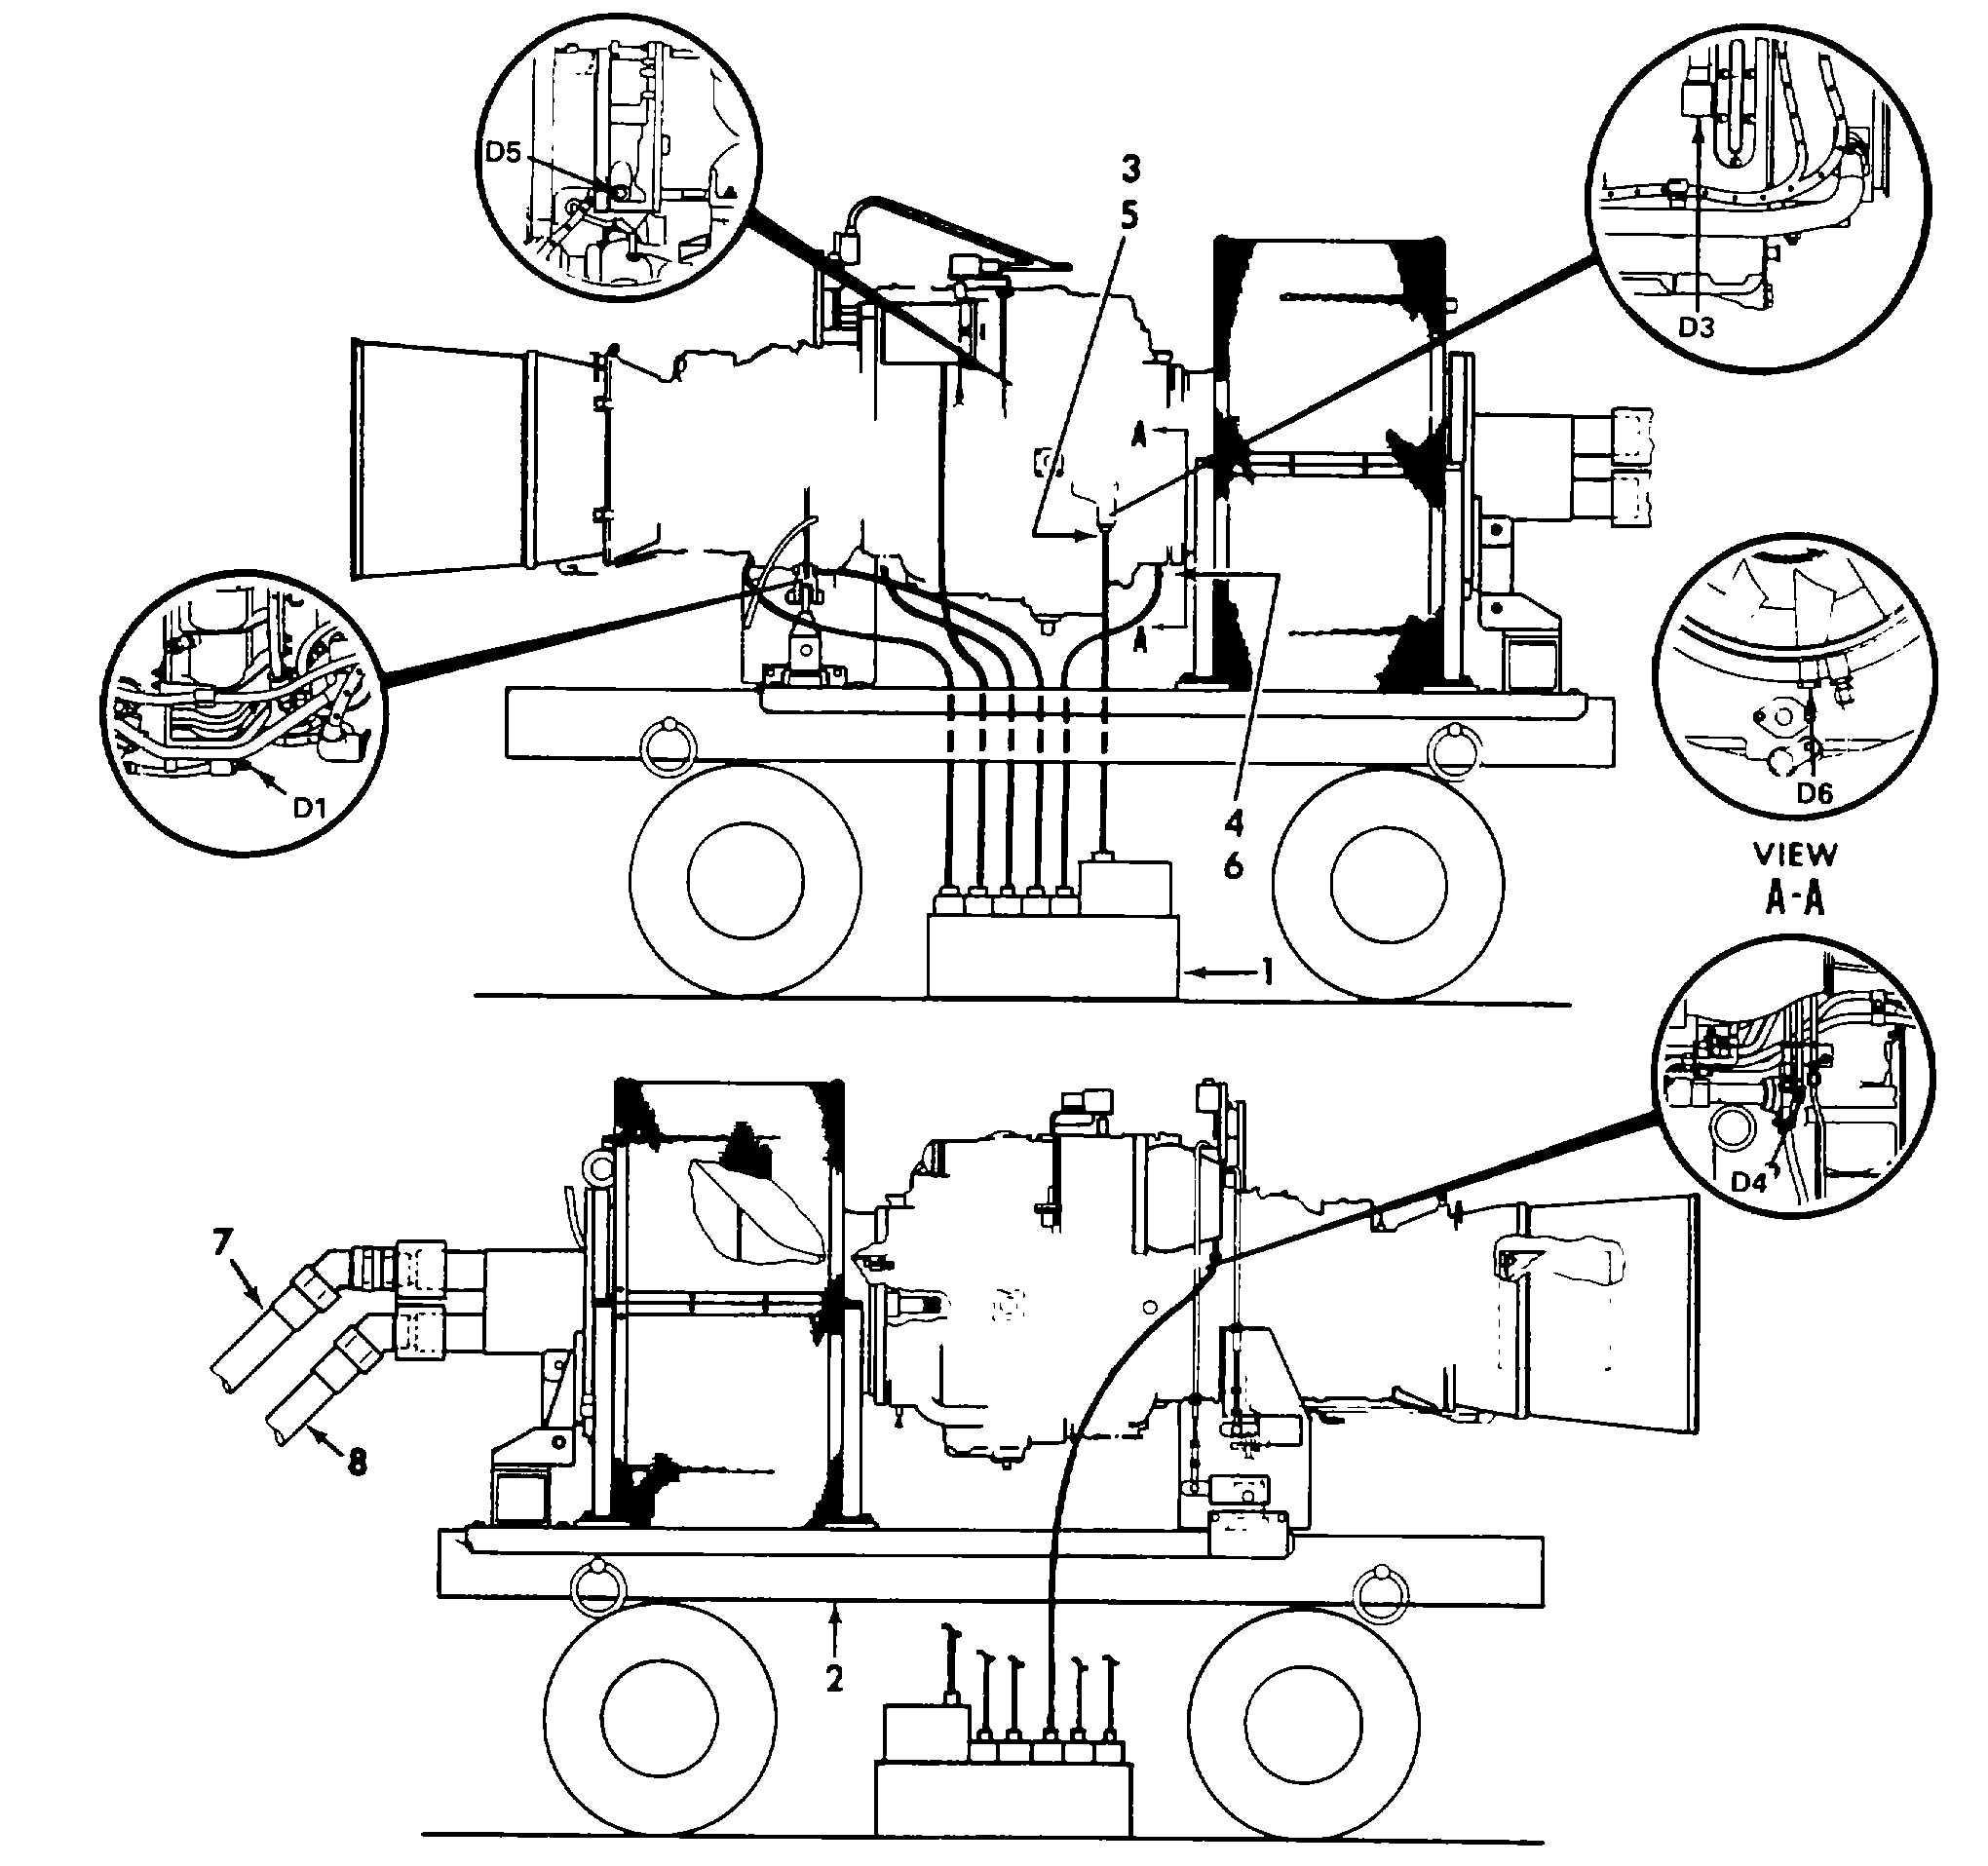 T700 Engines